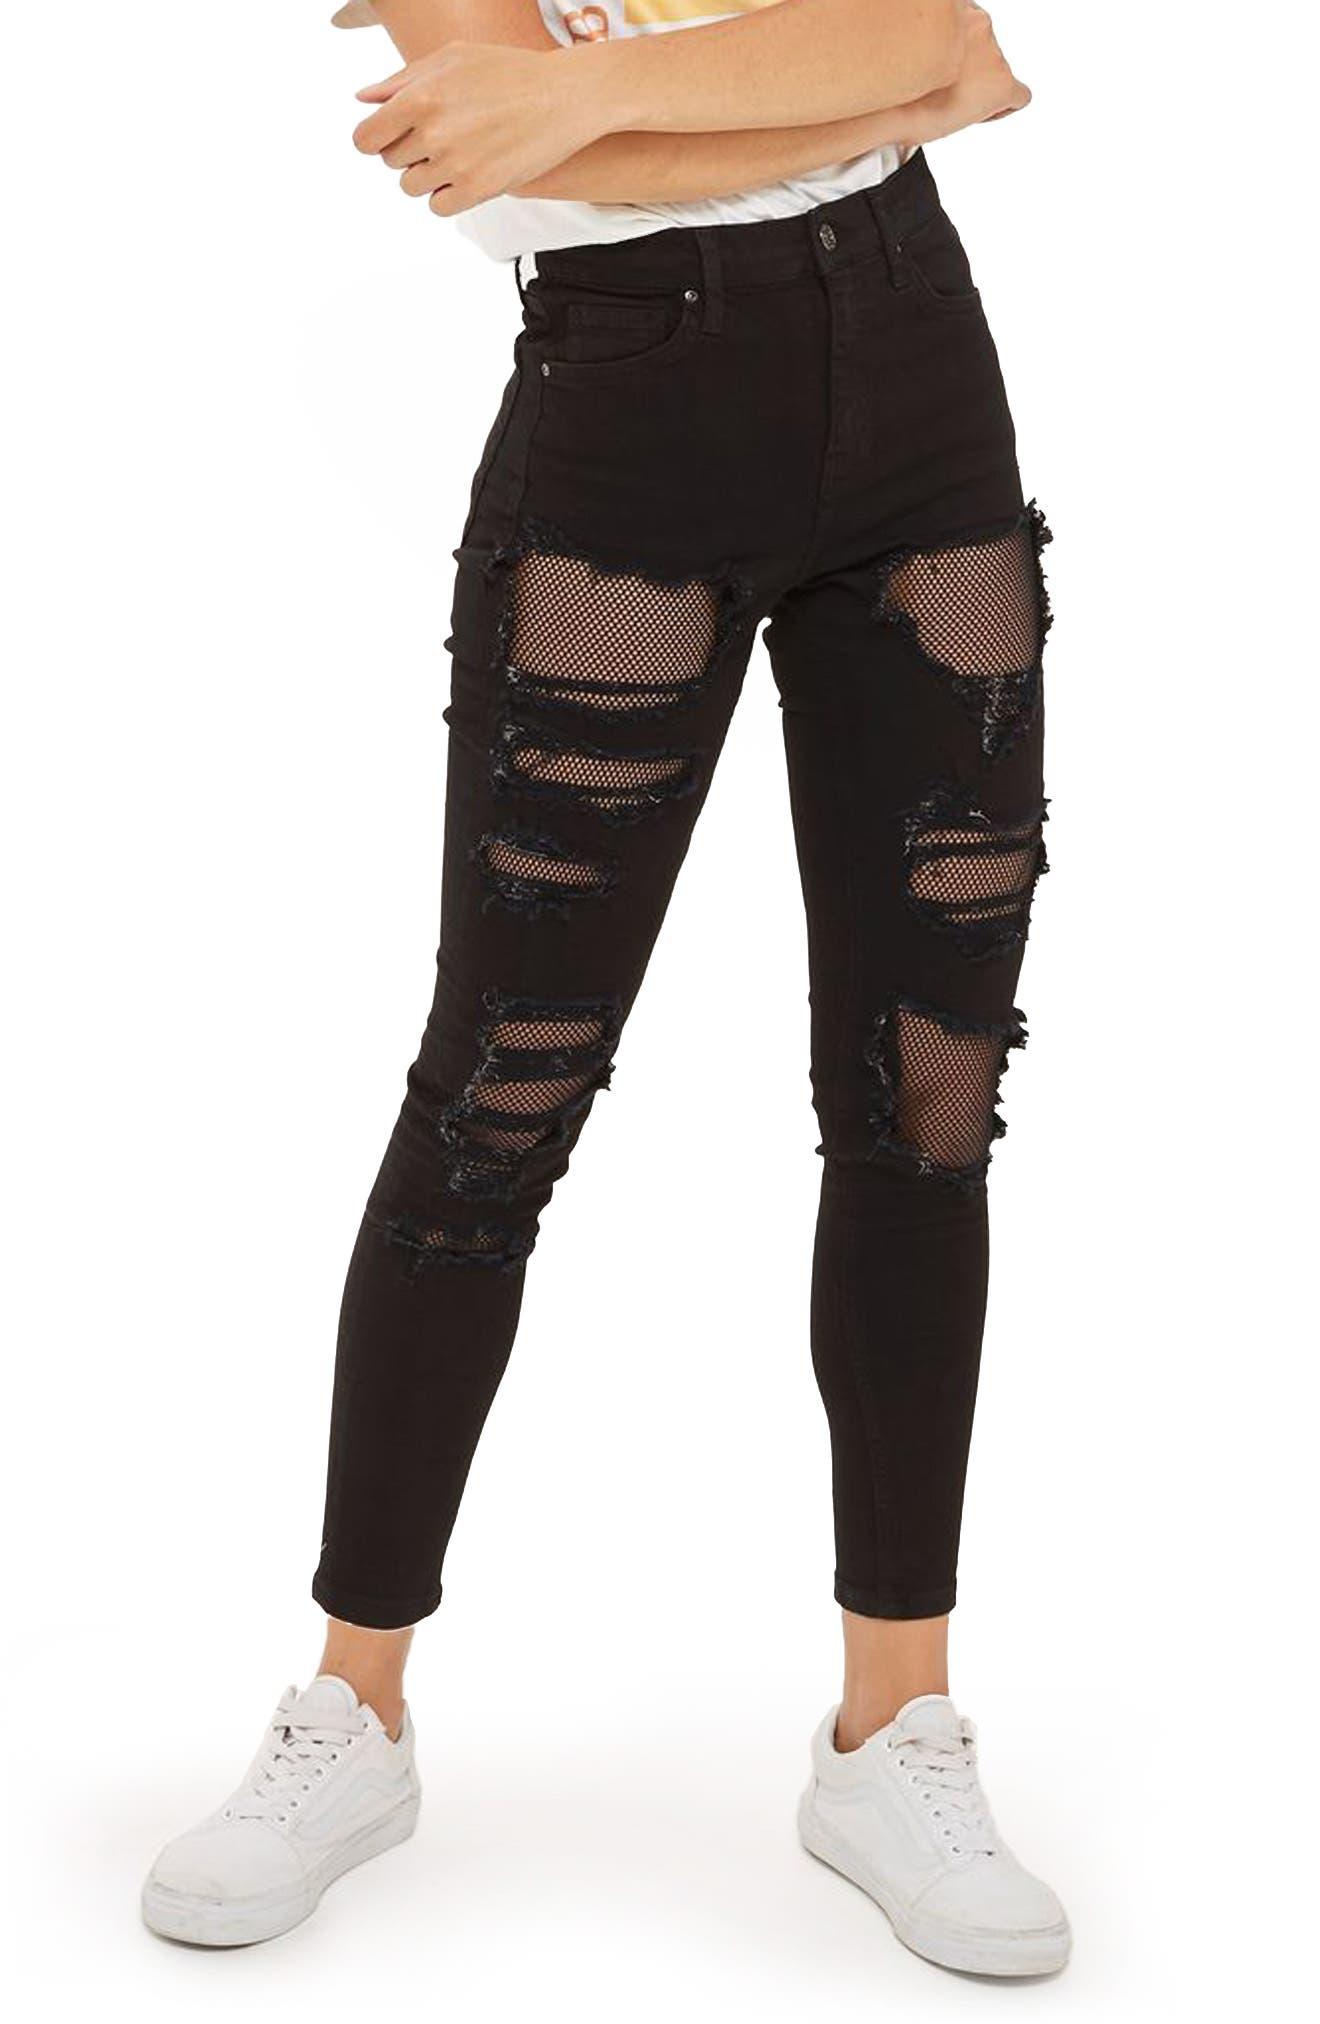 Jamie Black Fishnet Rip Skinny Jeans,                             Main thumbnail 1, color,                             Black